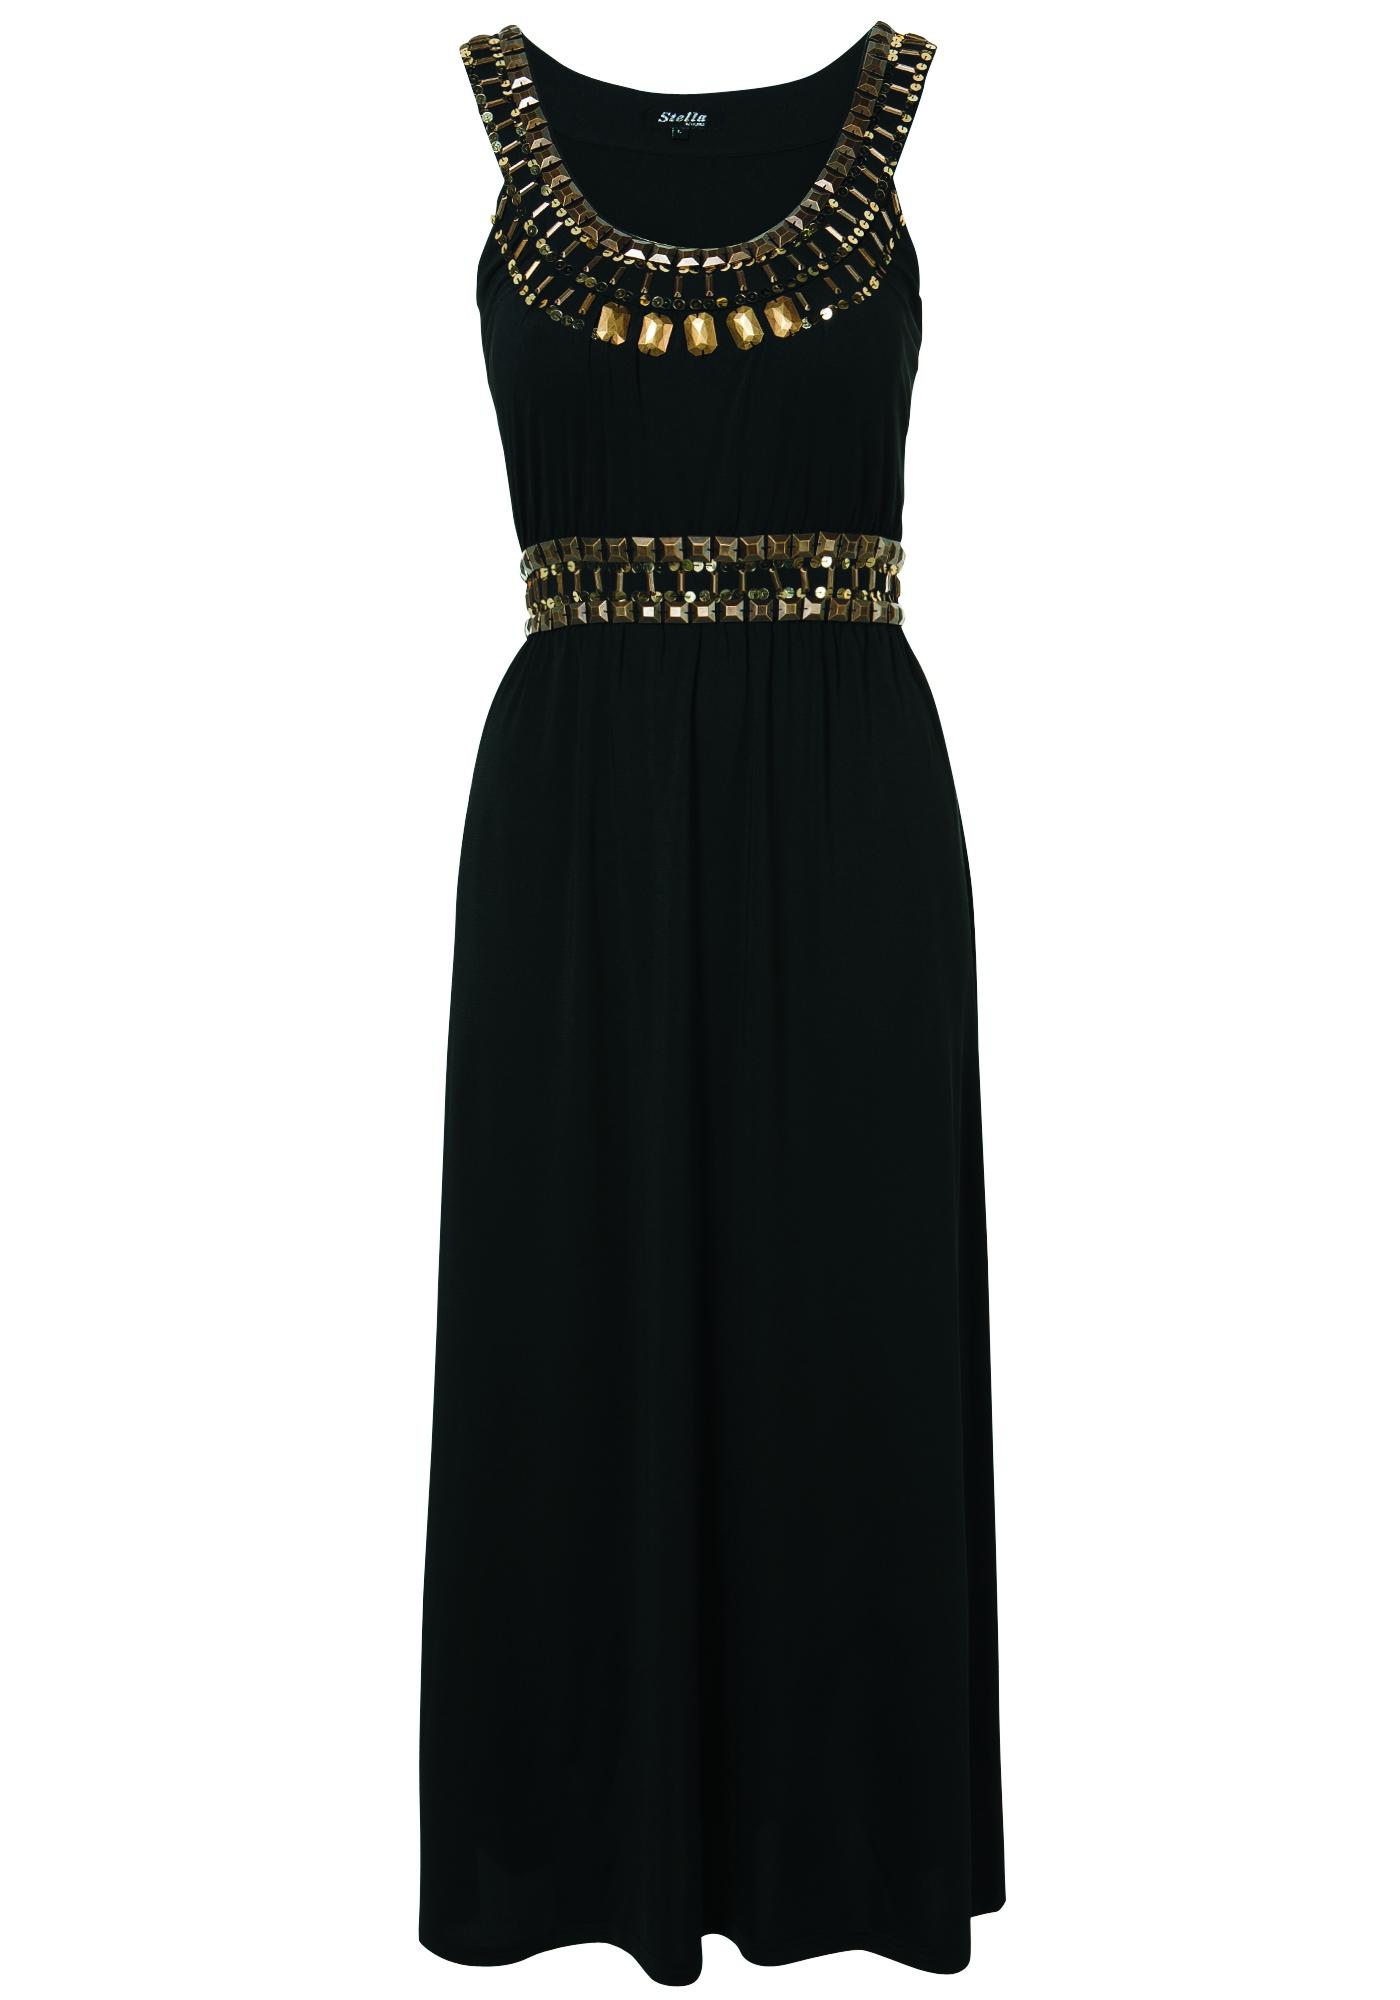 Stella morgan at tesco embellished maxi dress 163 28 woman magazine